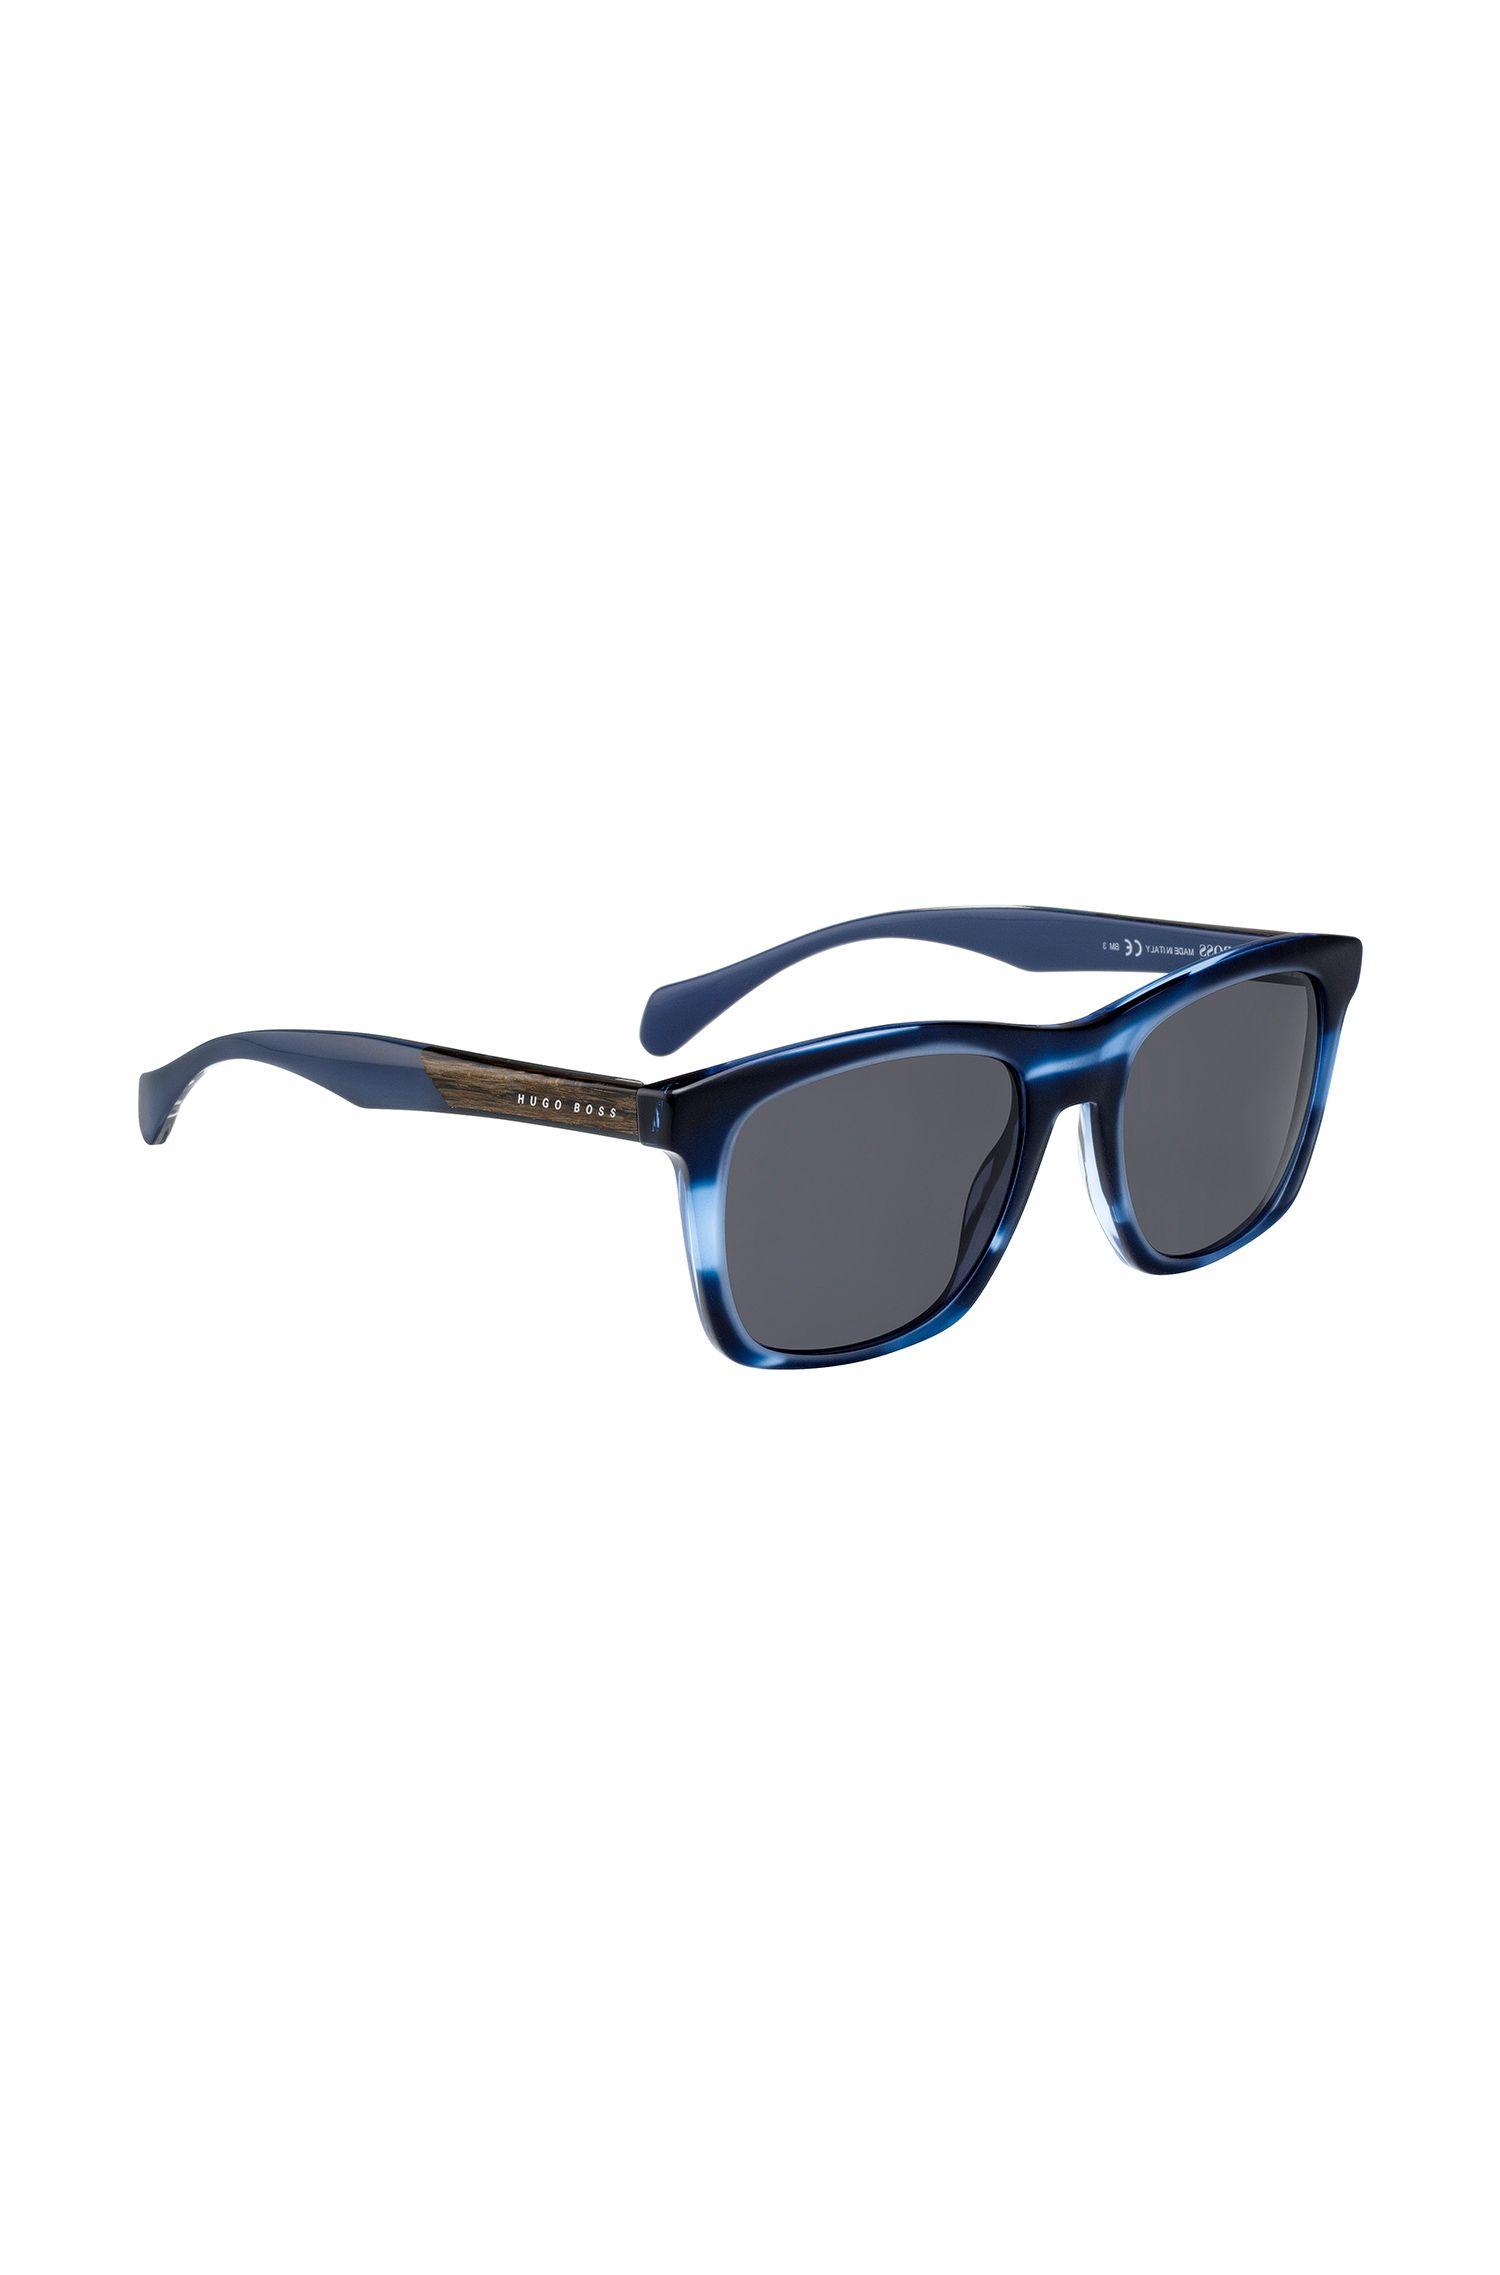 Acetate Rectangular Sunglasses | BOSS 0911/S, Assorted-Pre-Pack